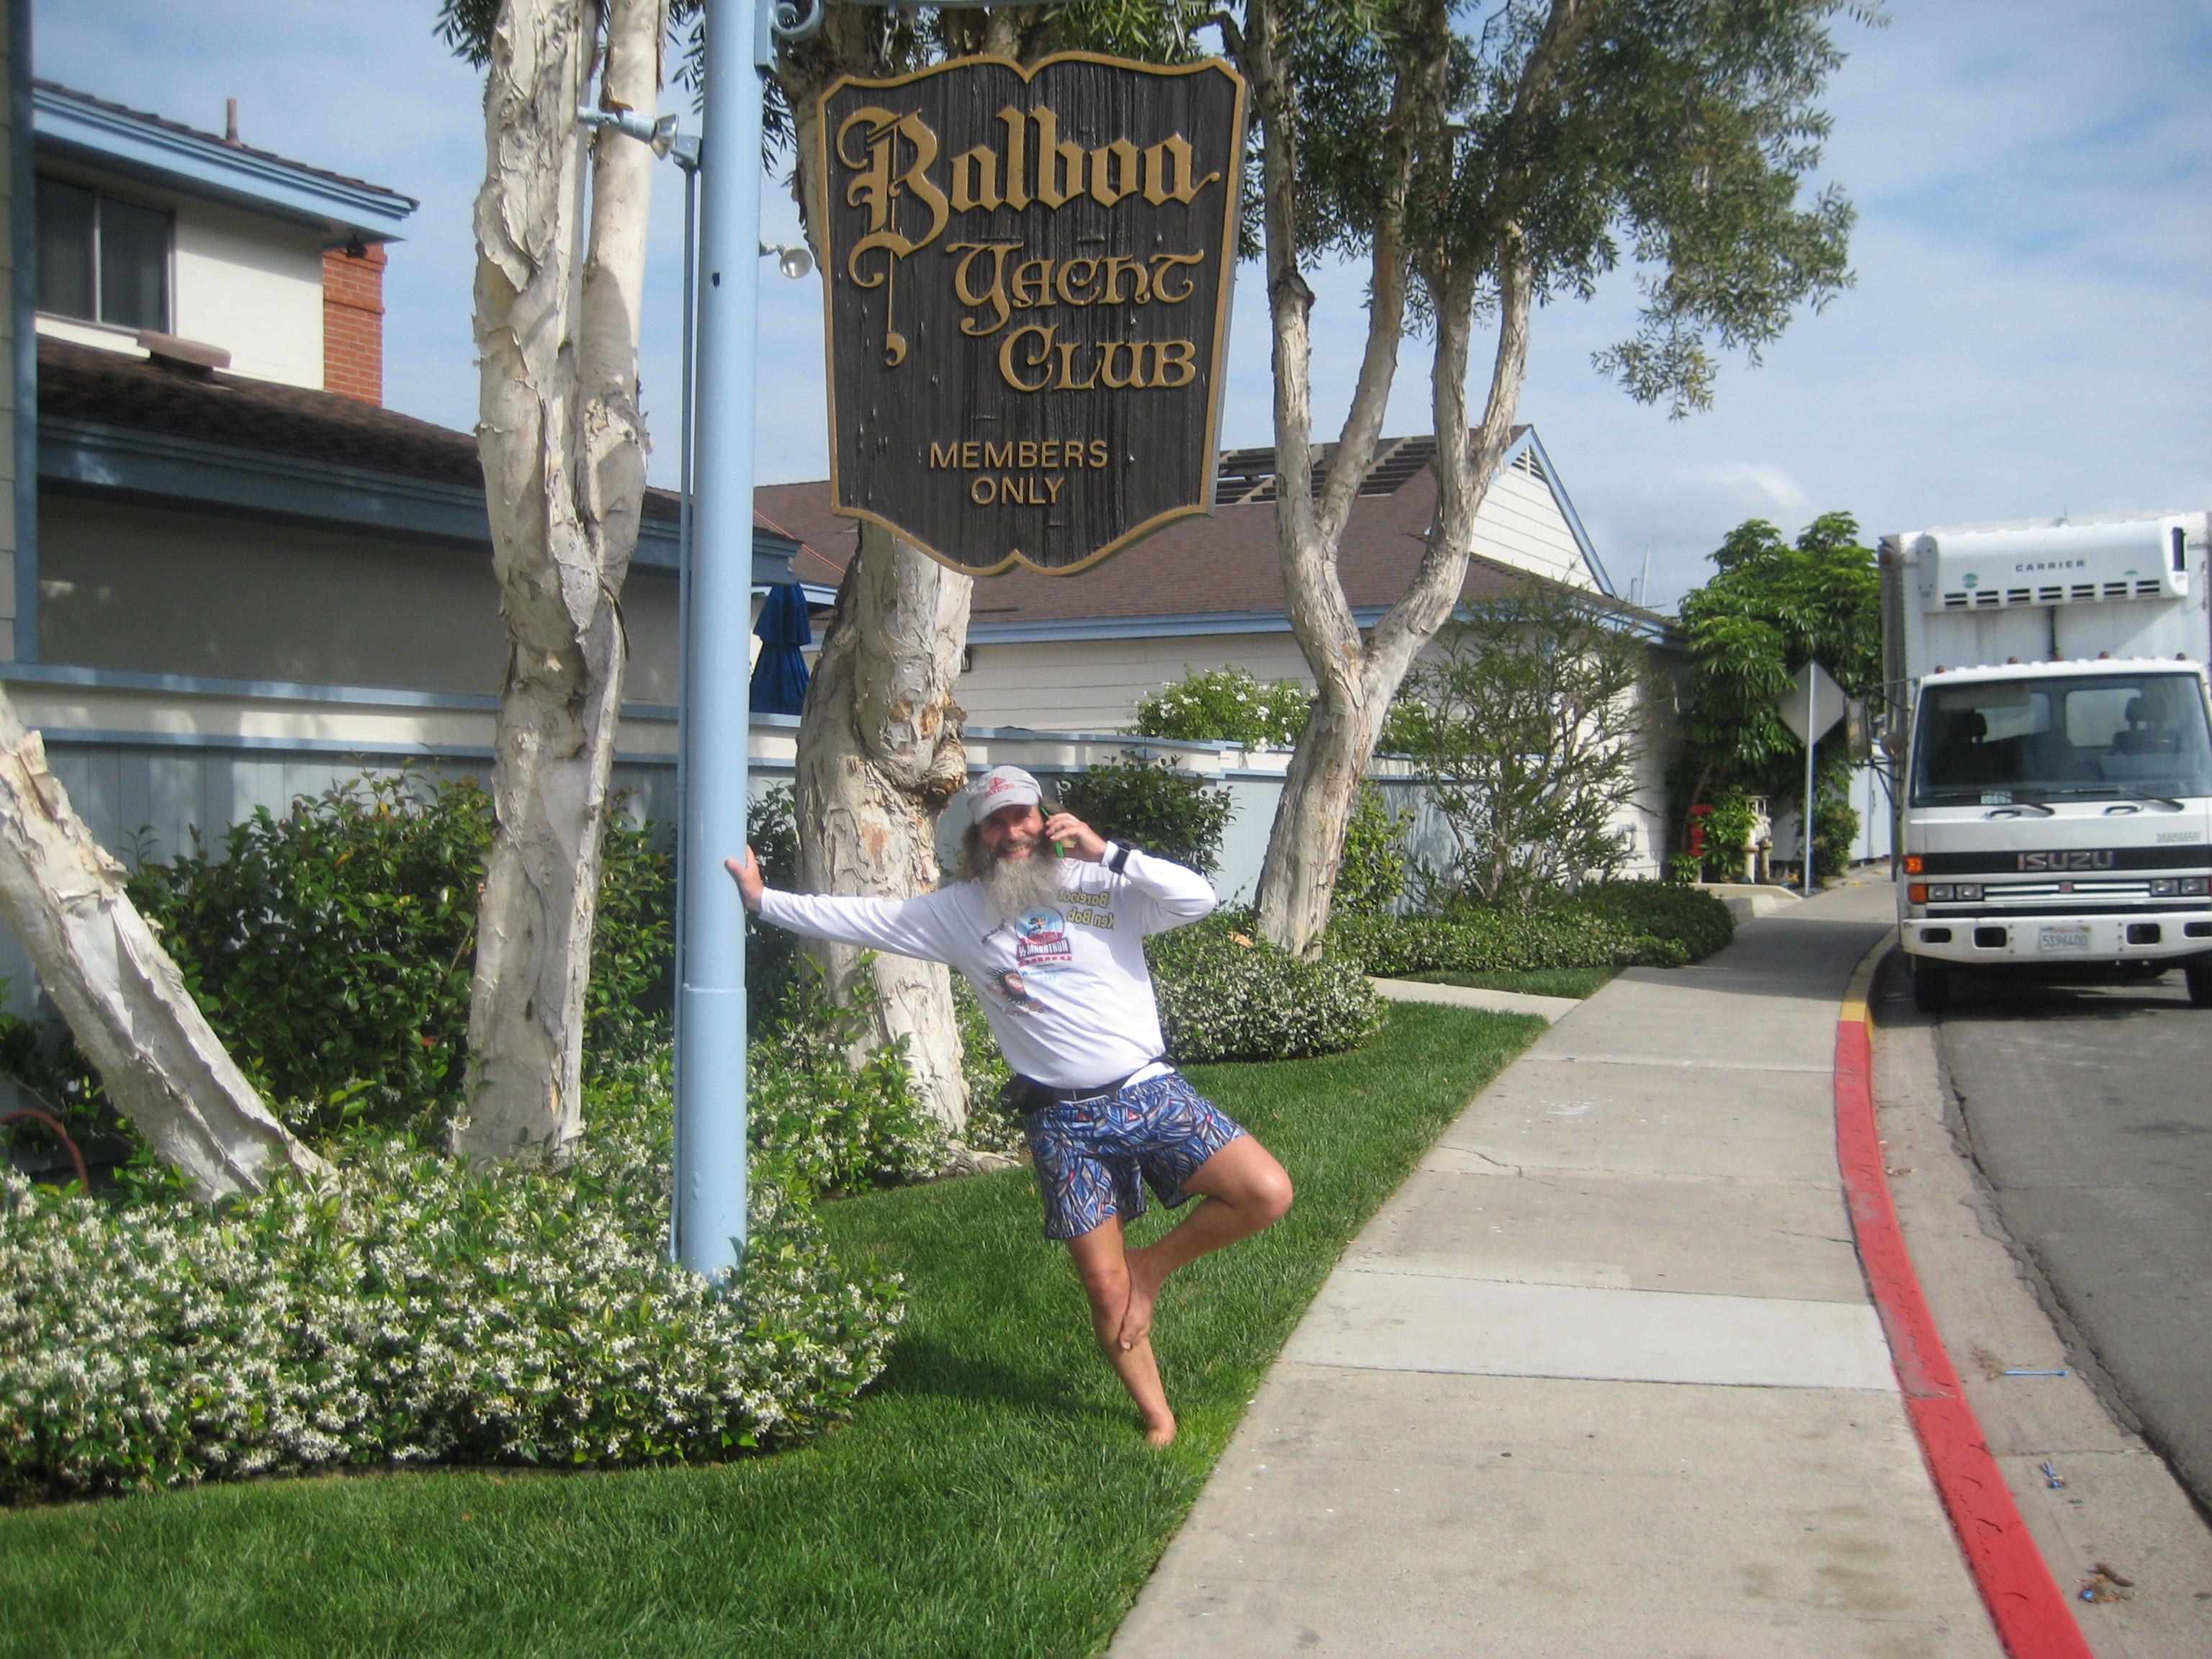 Ken Bob, Balboa Yacht Club